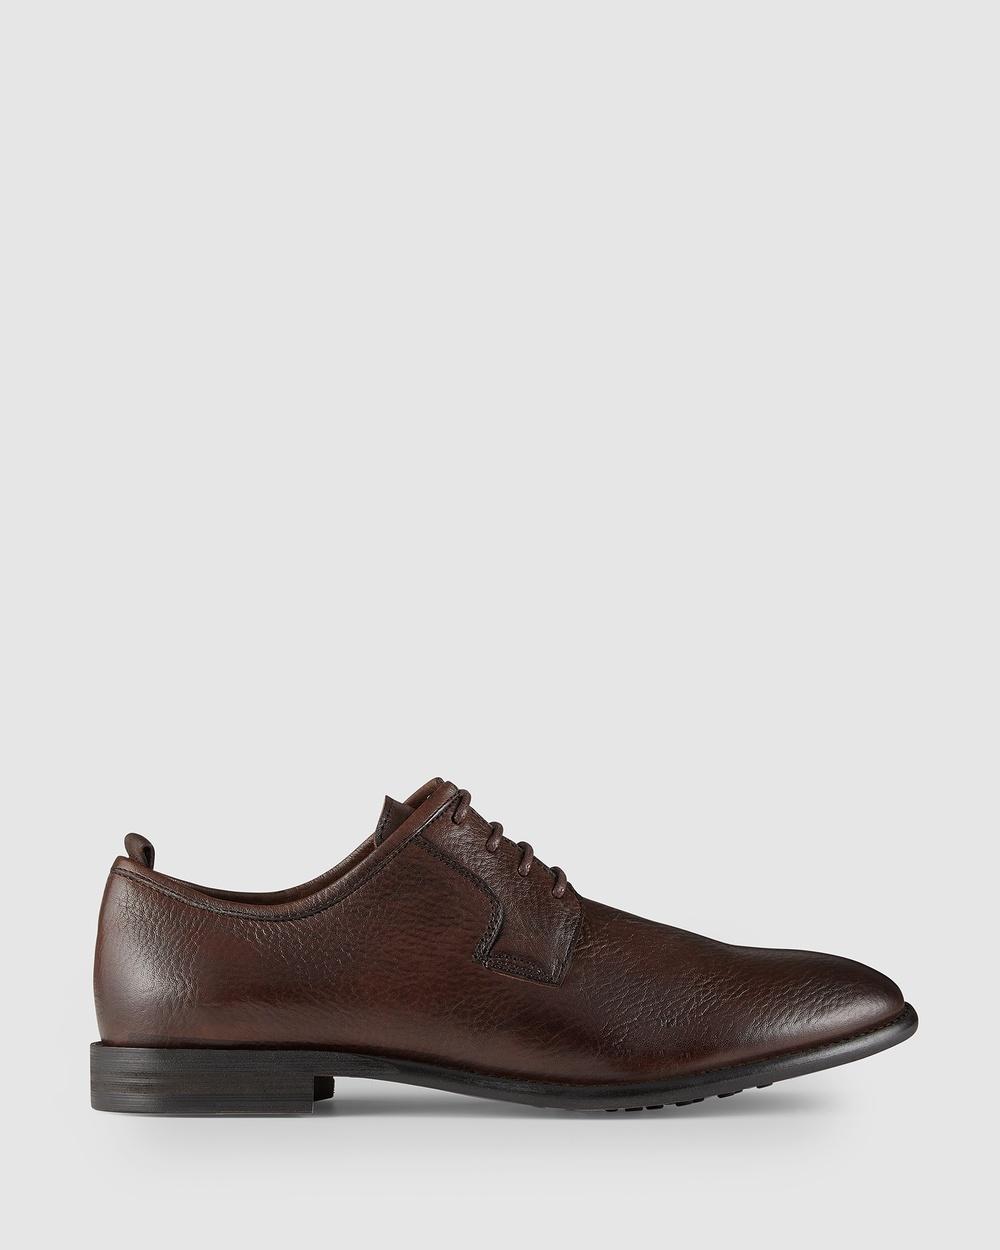 Aquila Hudley Lace Up Shoes Dress Light Brown